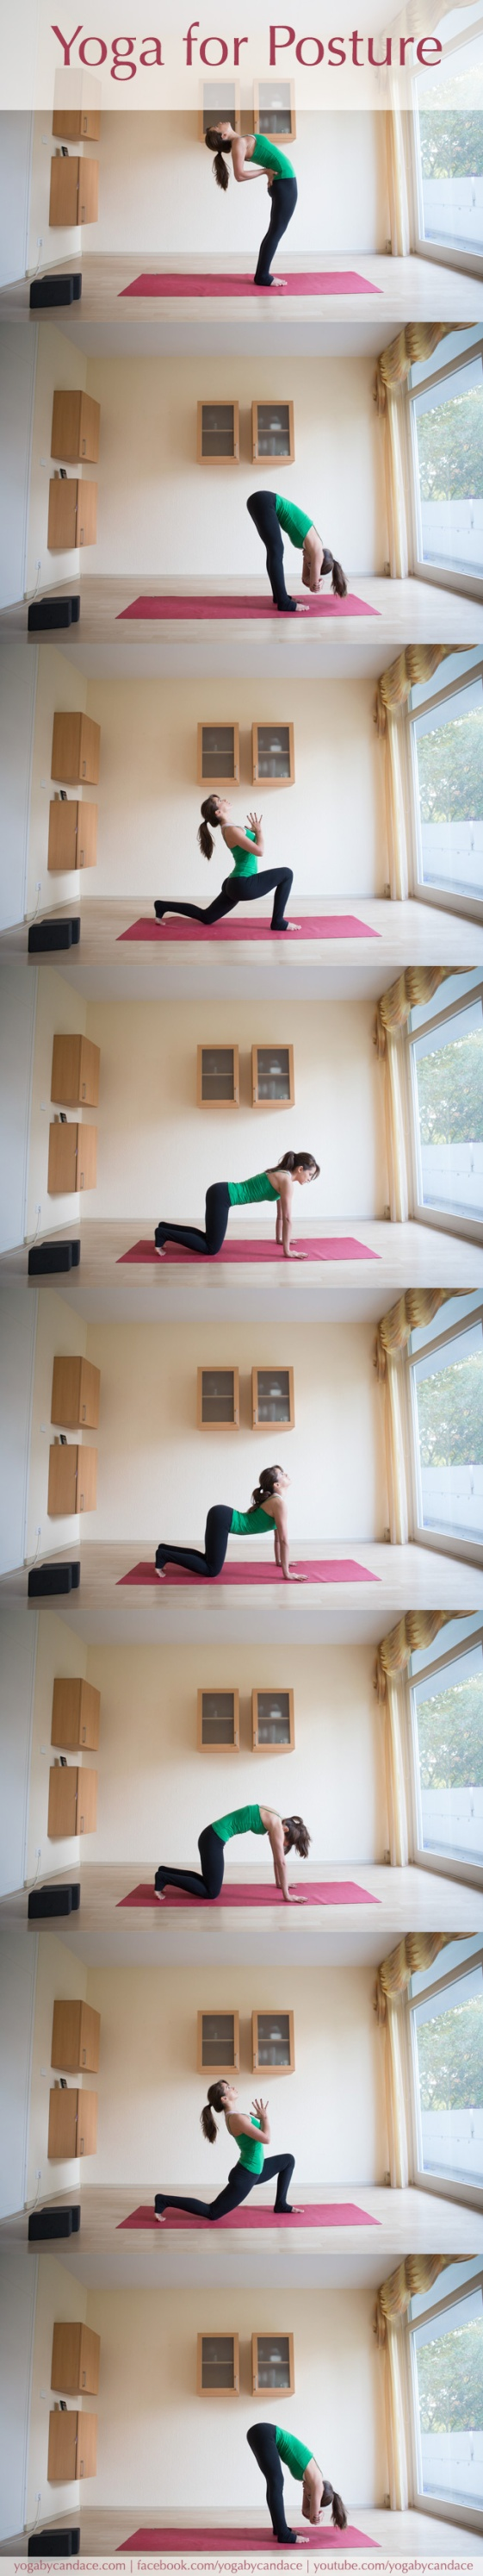 yoga-for-posture